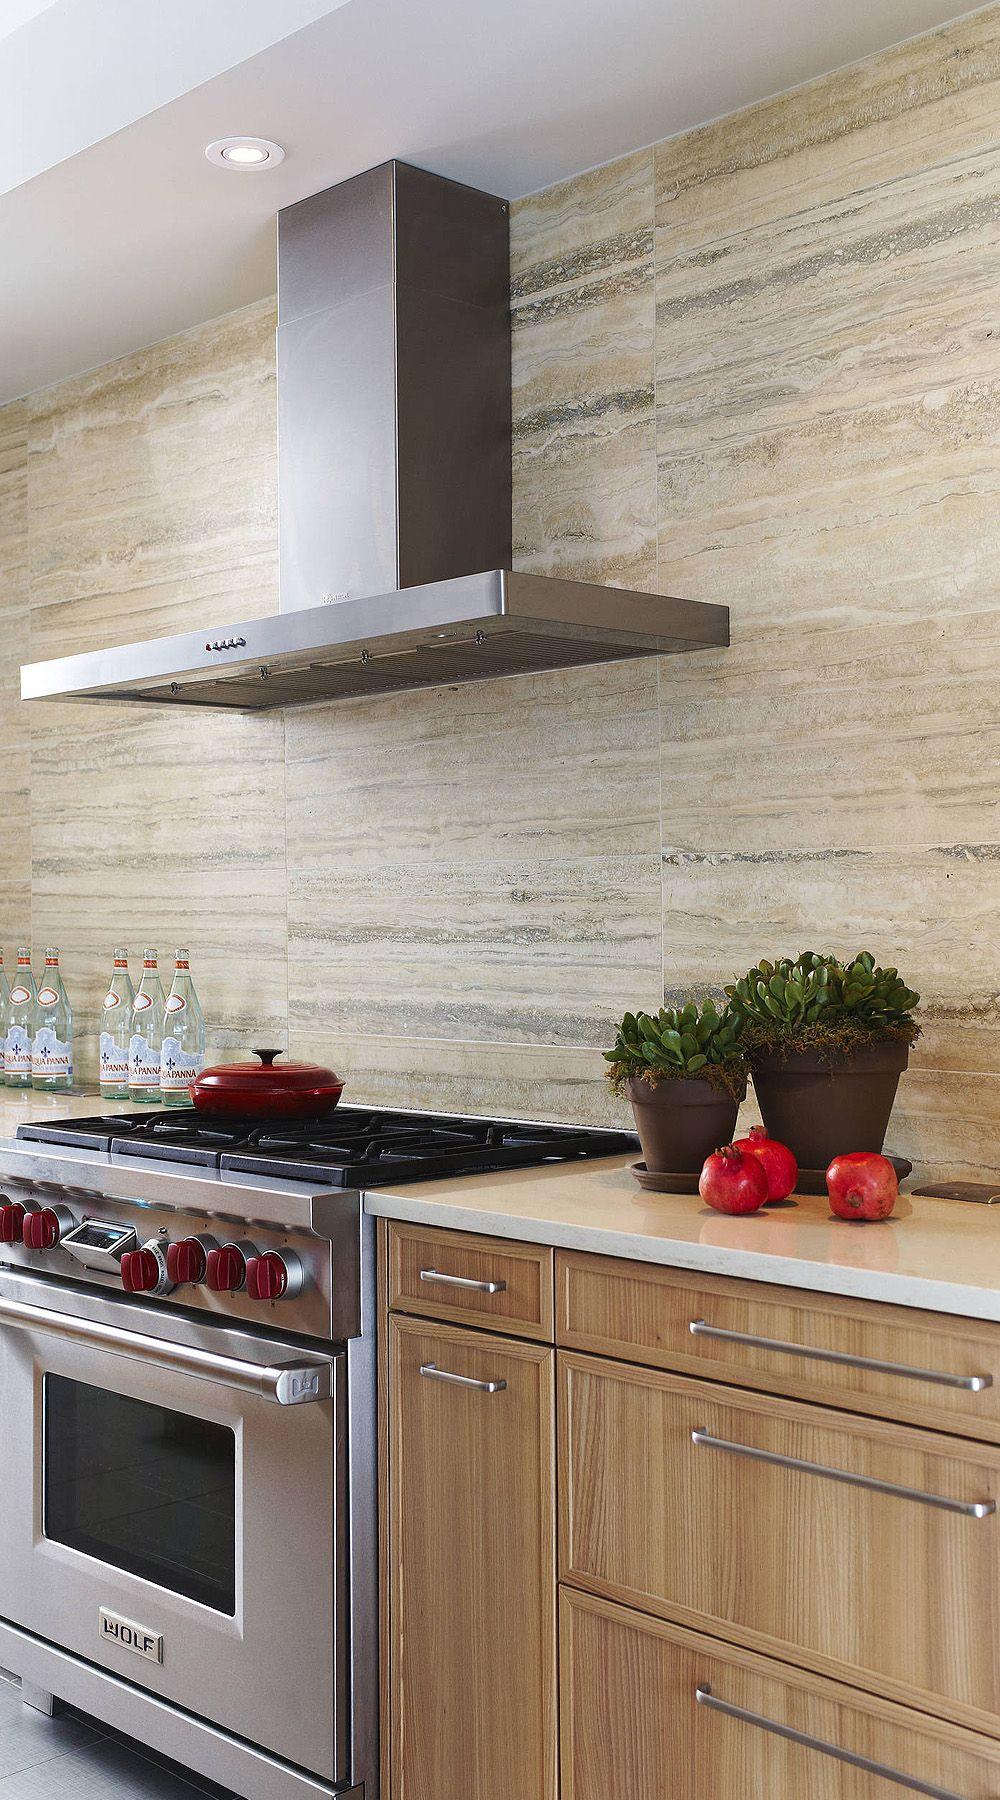 29 Ivory Travertine Backsplash Tile Ideas Natural Design Style Travertine Backsplash Contemporary Kitchen Remodel Contemporary Kitchen Backsplash